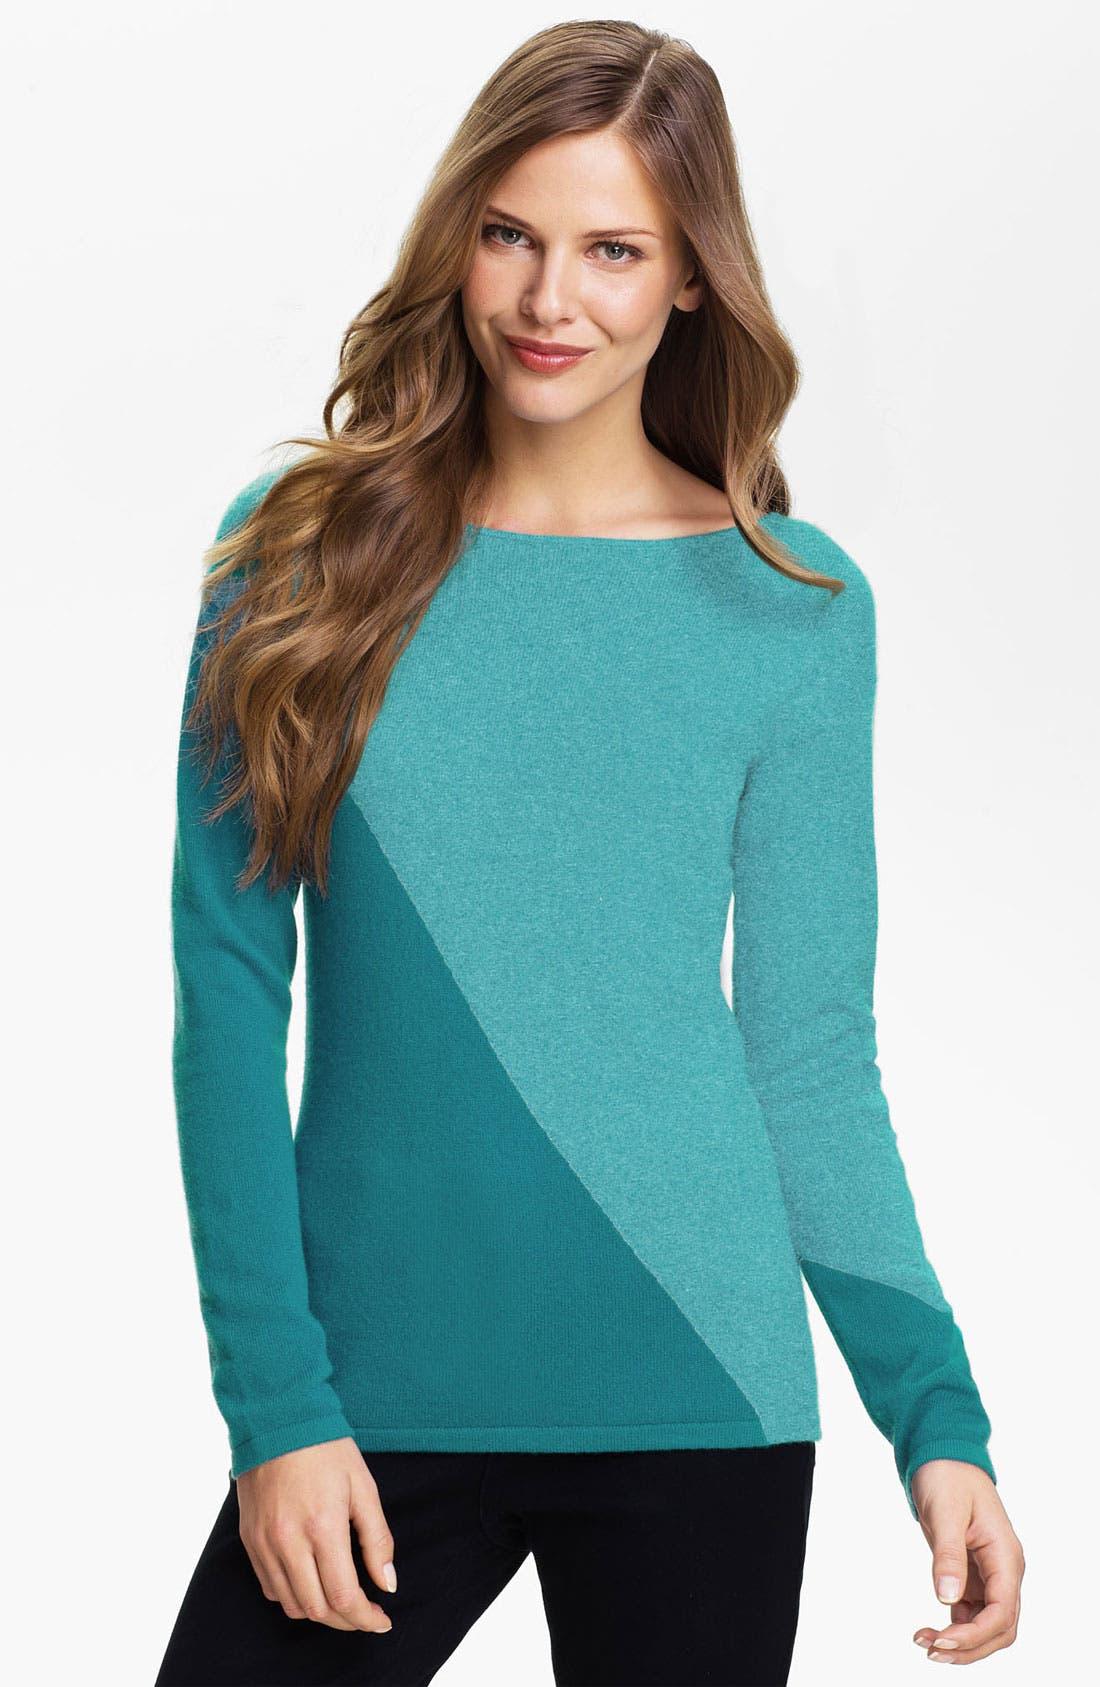 Alternate Image 1 Selected - Lauren Hansen Colorblock Cashmere Sweater